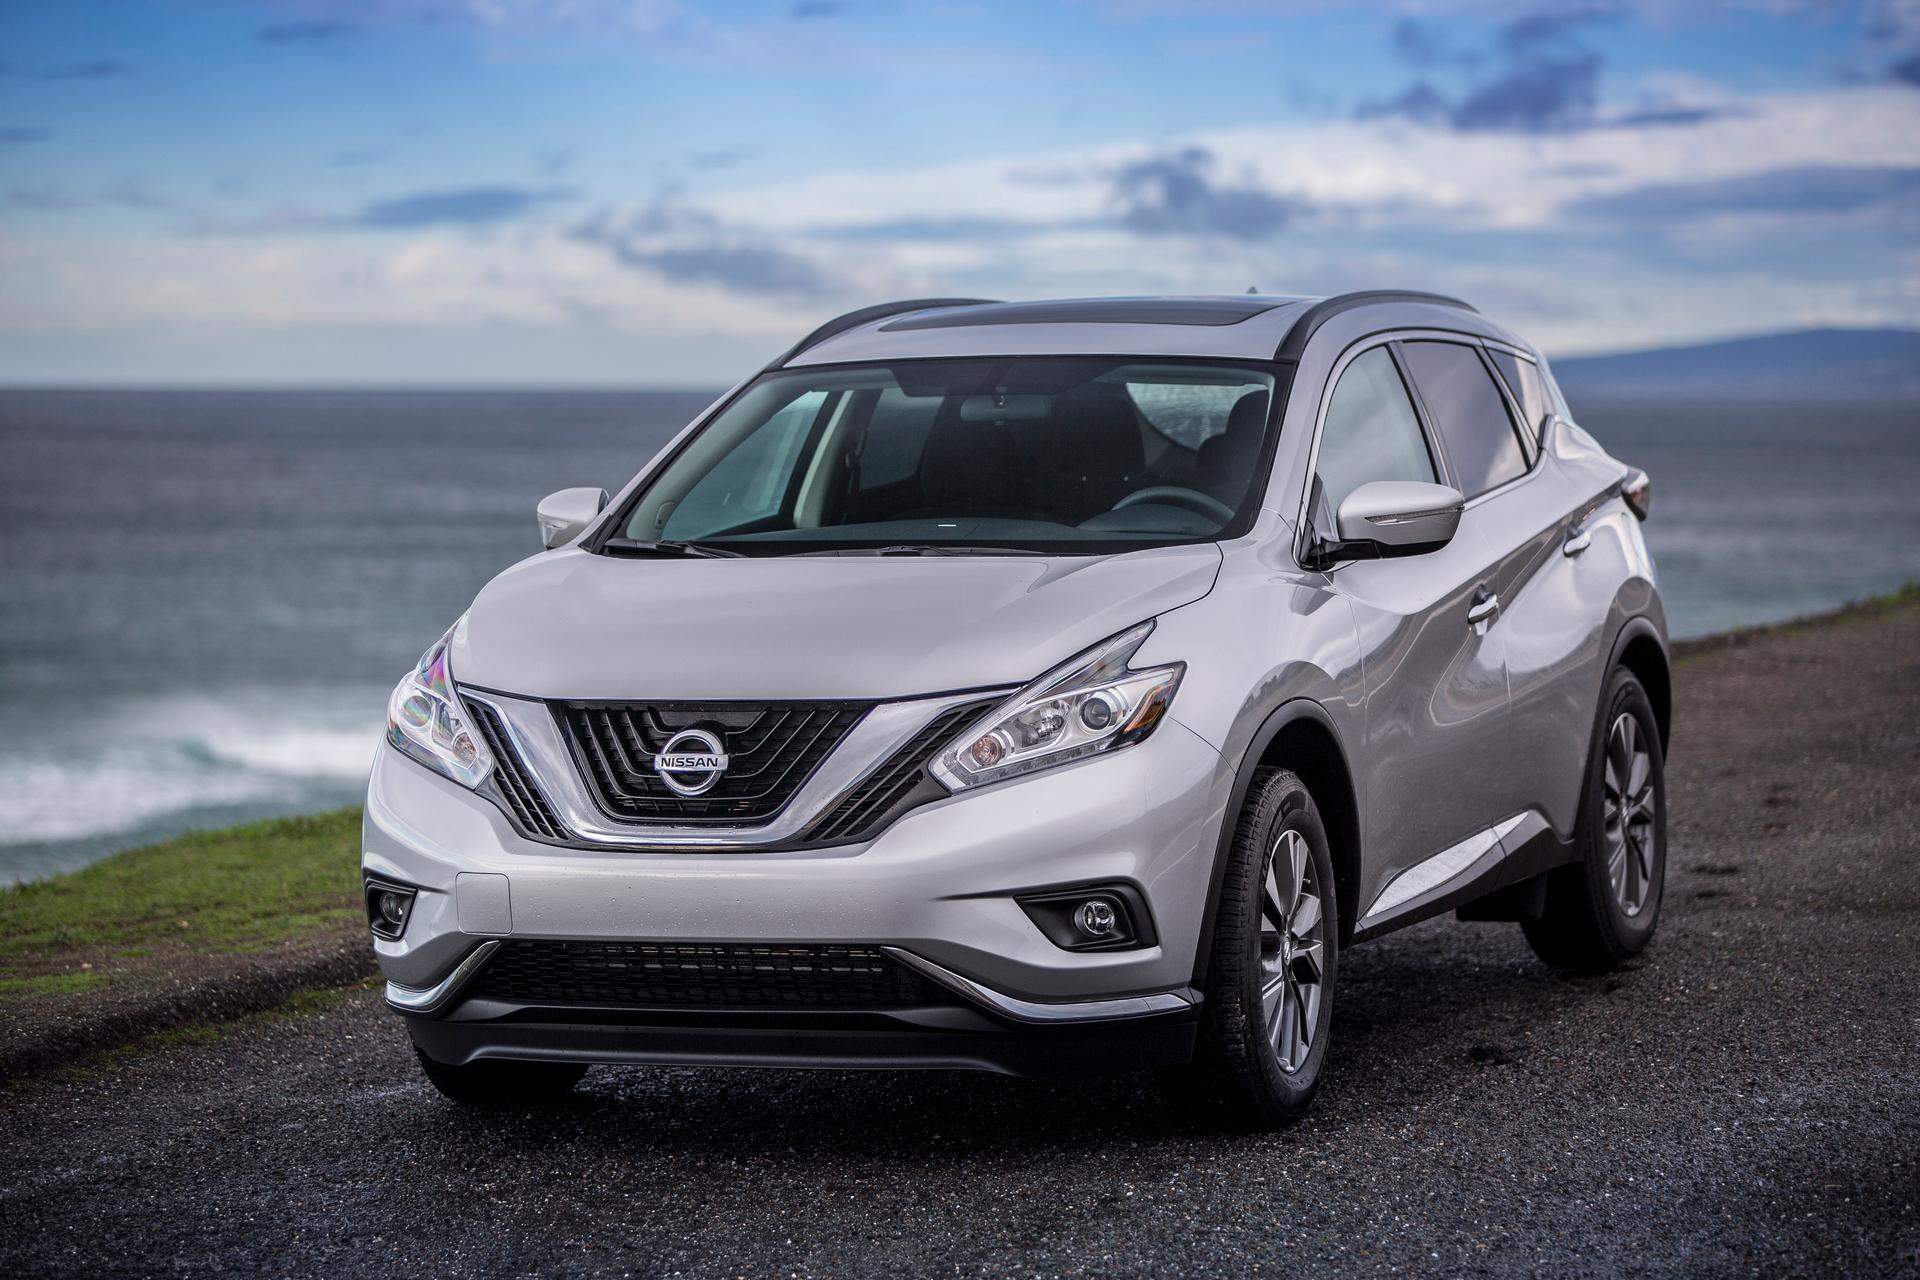 2015 Nissan Murano © Nissan Motor Co., Ltd.